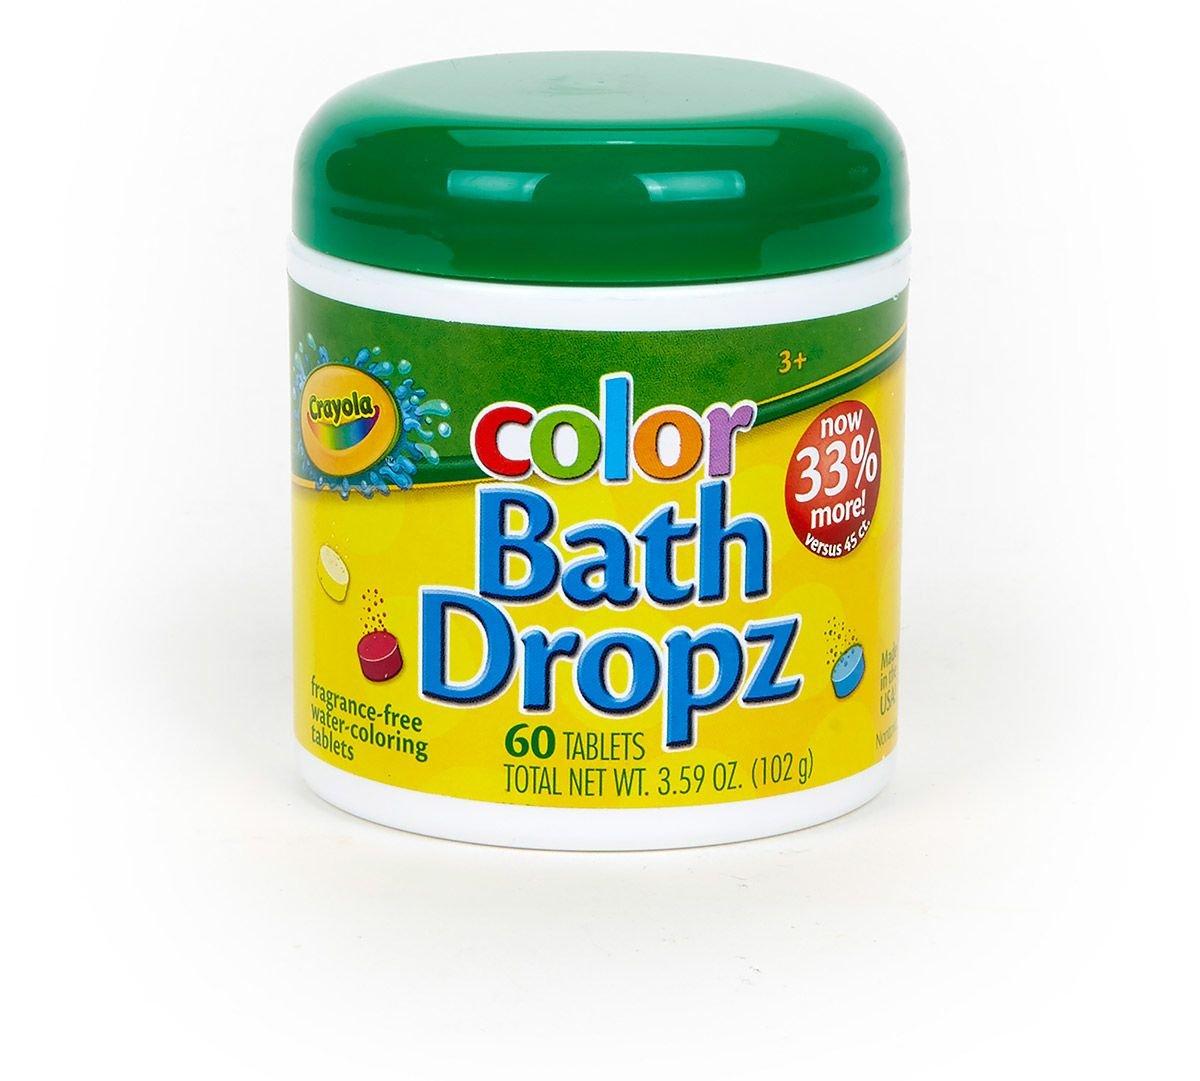 Crayola Color Bath Dropz 60 Tablets 3.59 Ounce Jar (3 Pack) B01AMT1GXI